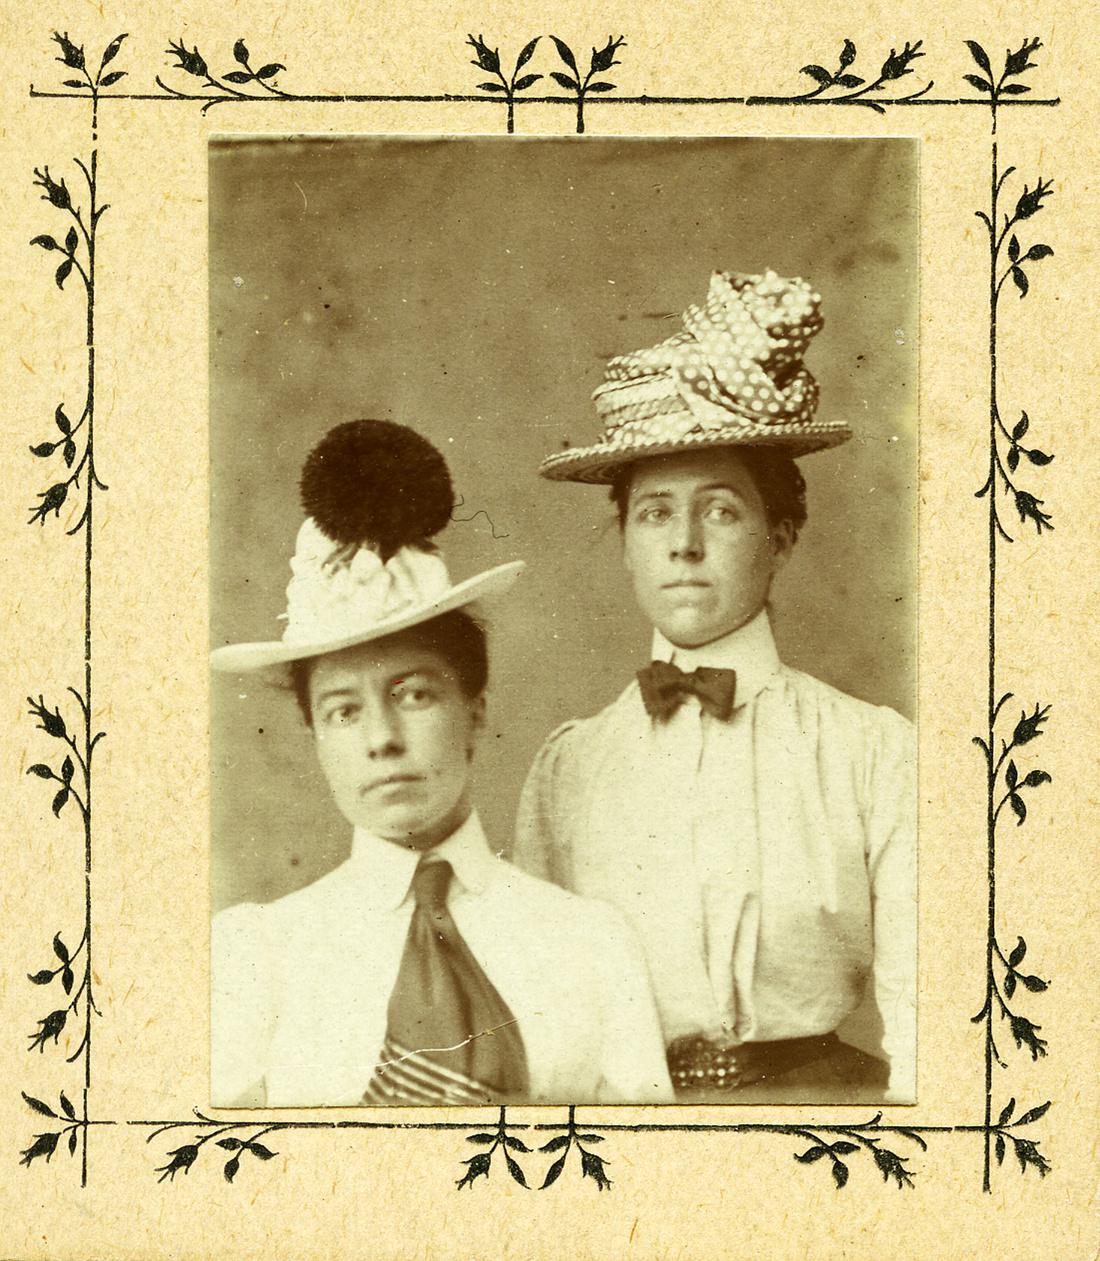 Alice Austen and Gertrude Tate, Pickards Penny Photo Studio, Stapleton Staten Island, c. 1905. Courtesy of Alice Austen House.